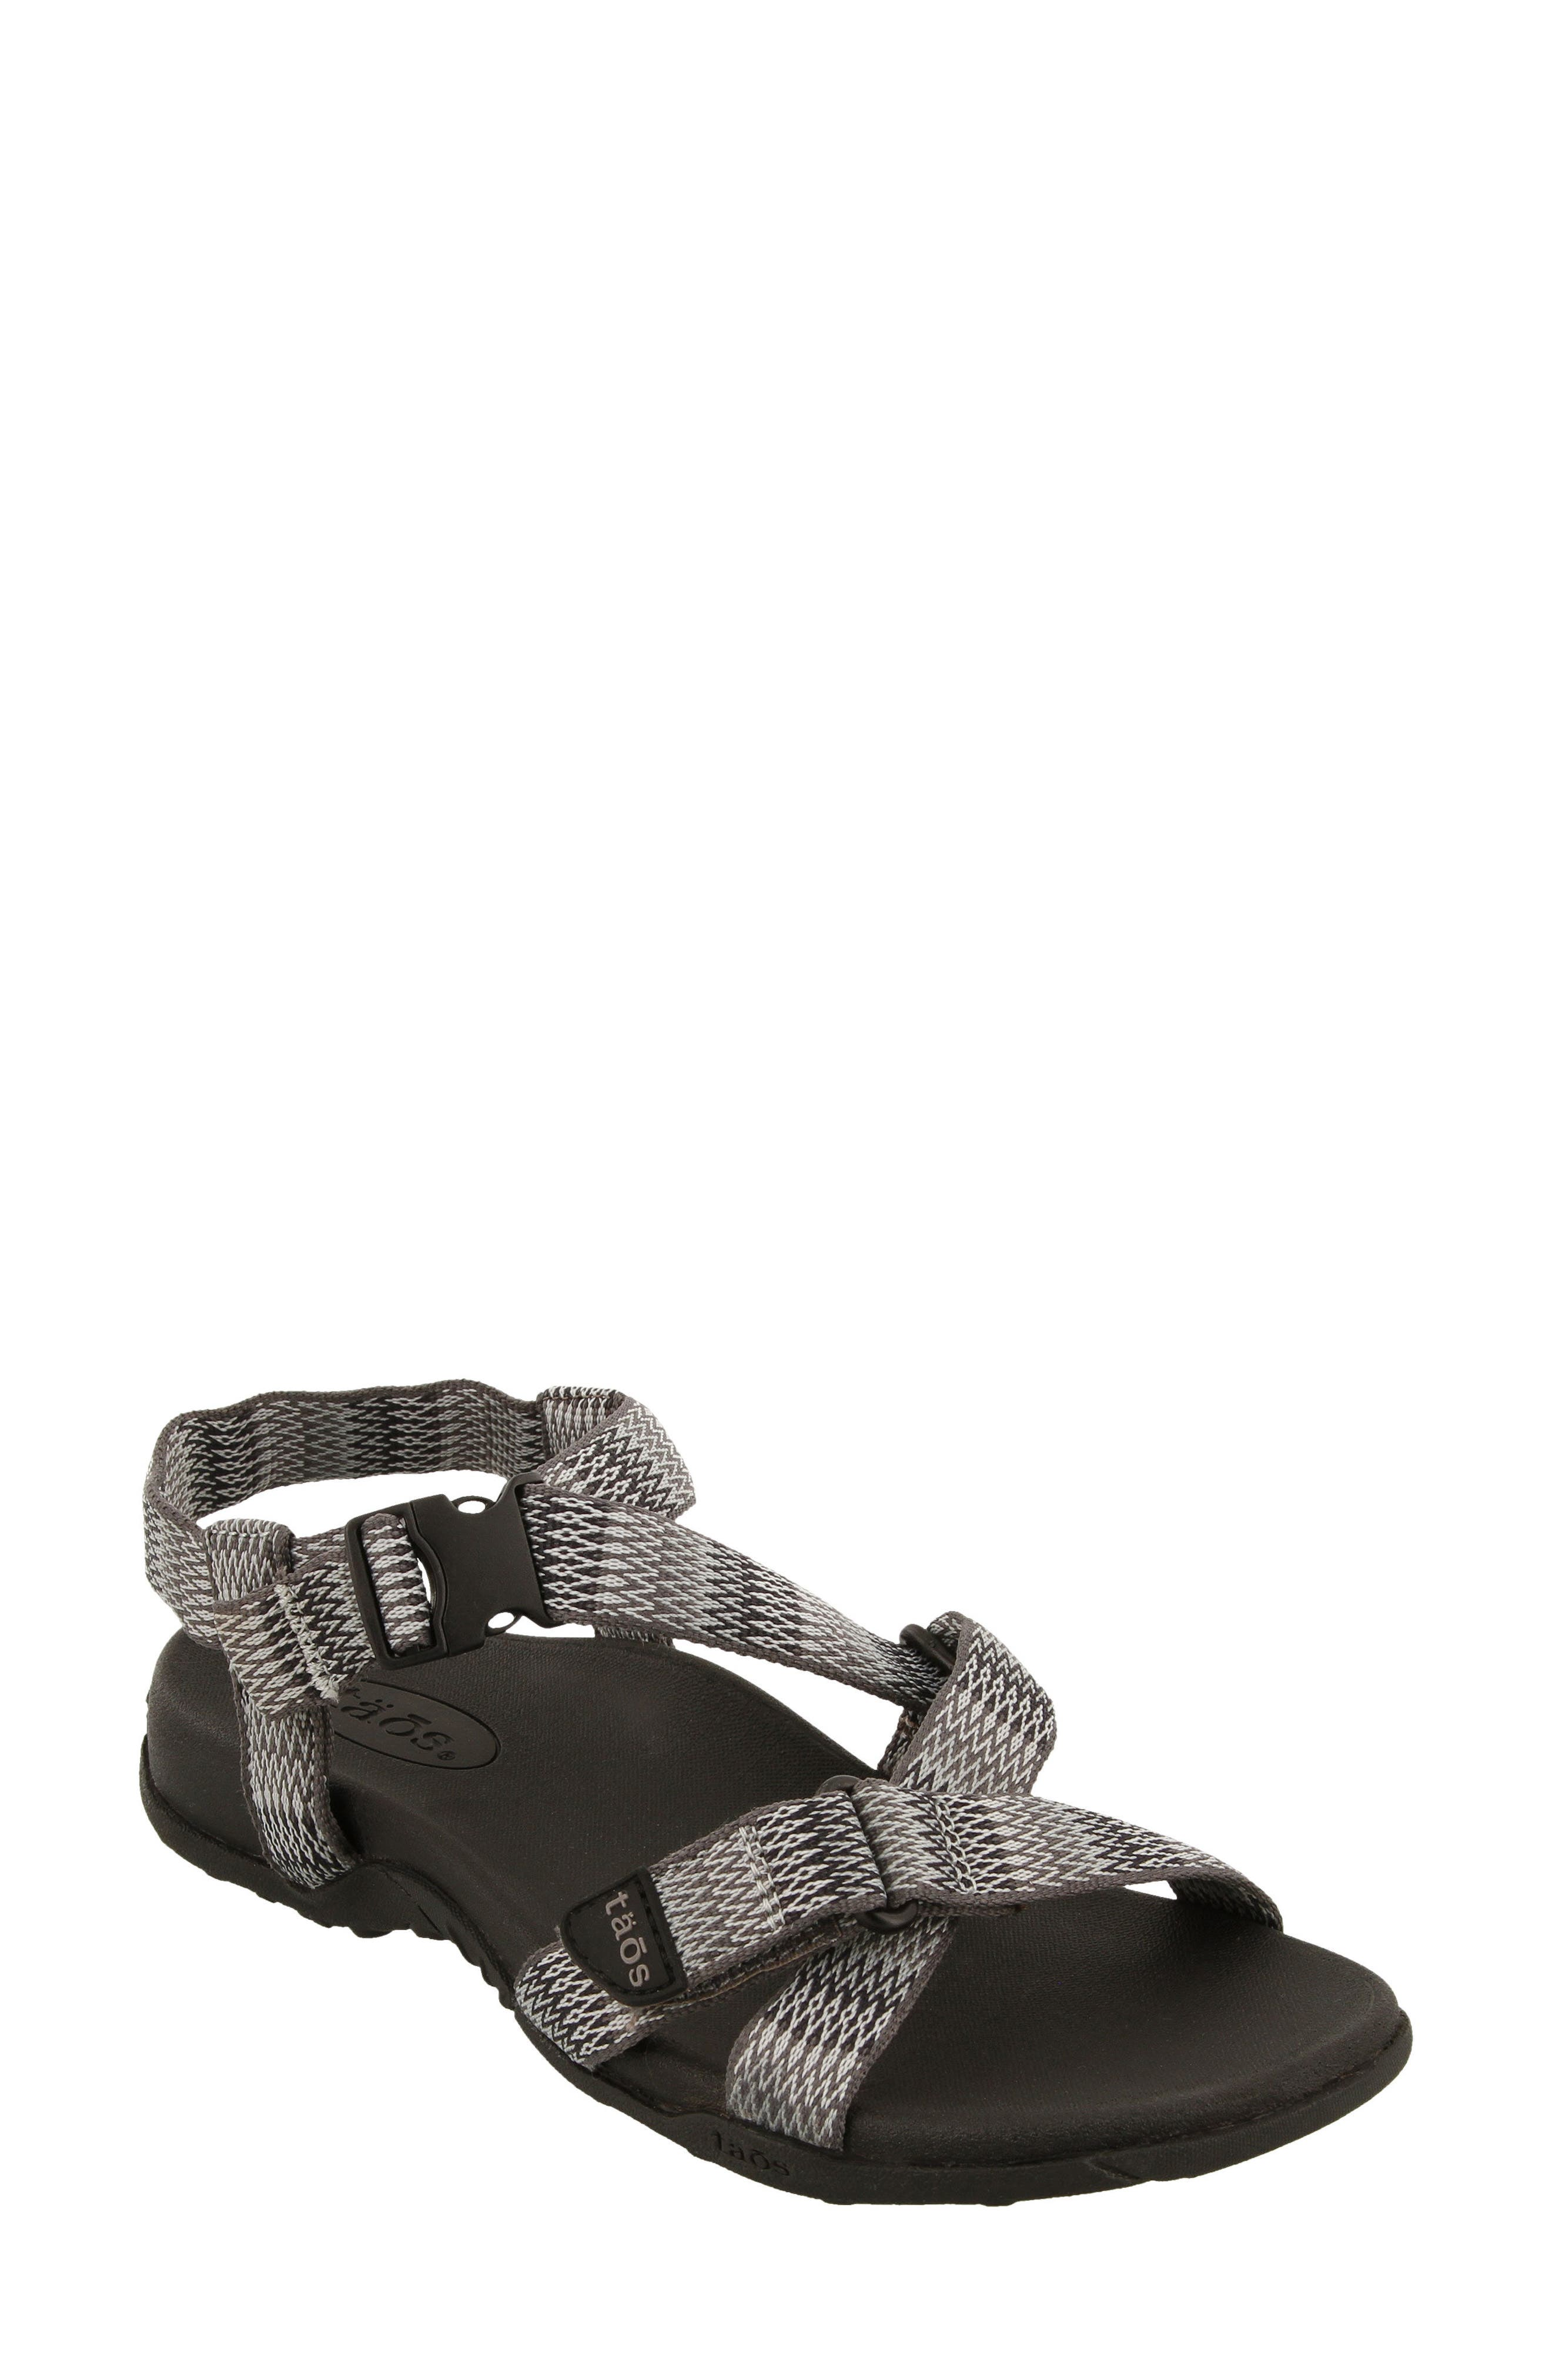 New Wave Sandal,                             Main thumbnail 1, color,                             BLACK FABRIC